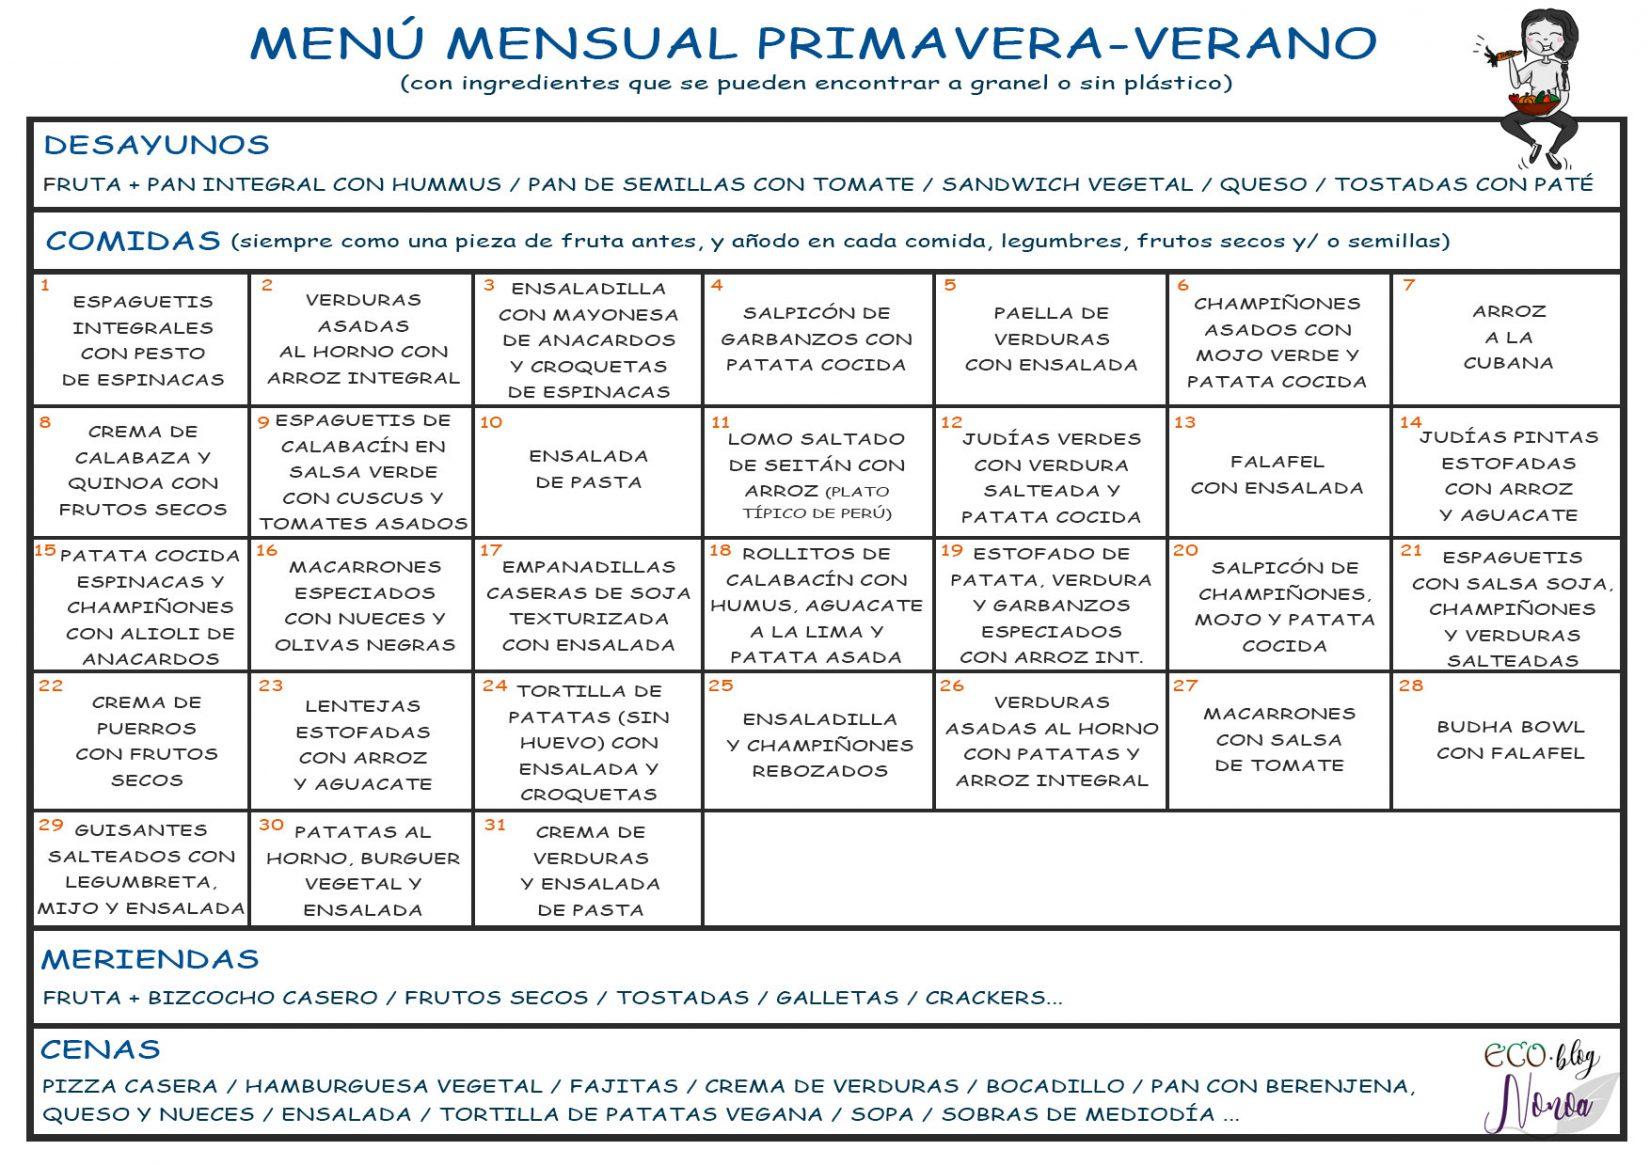 menu mensual para dieta